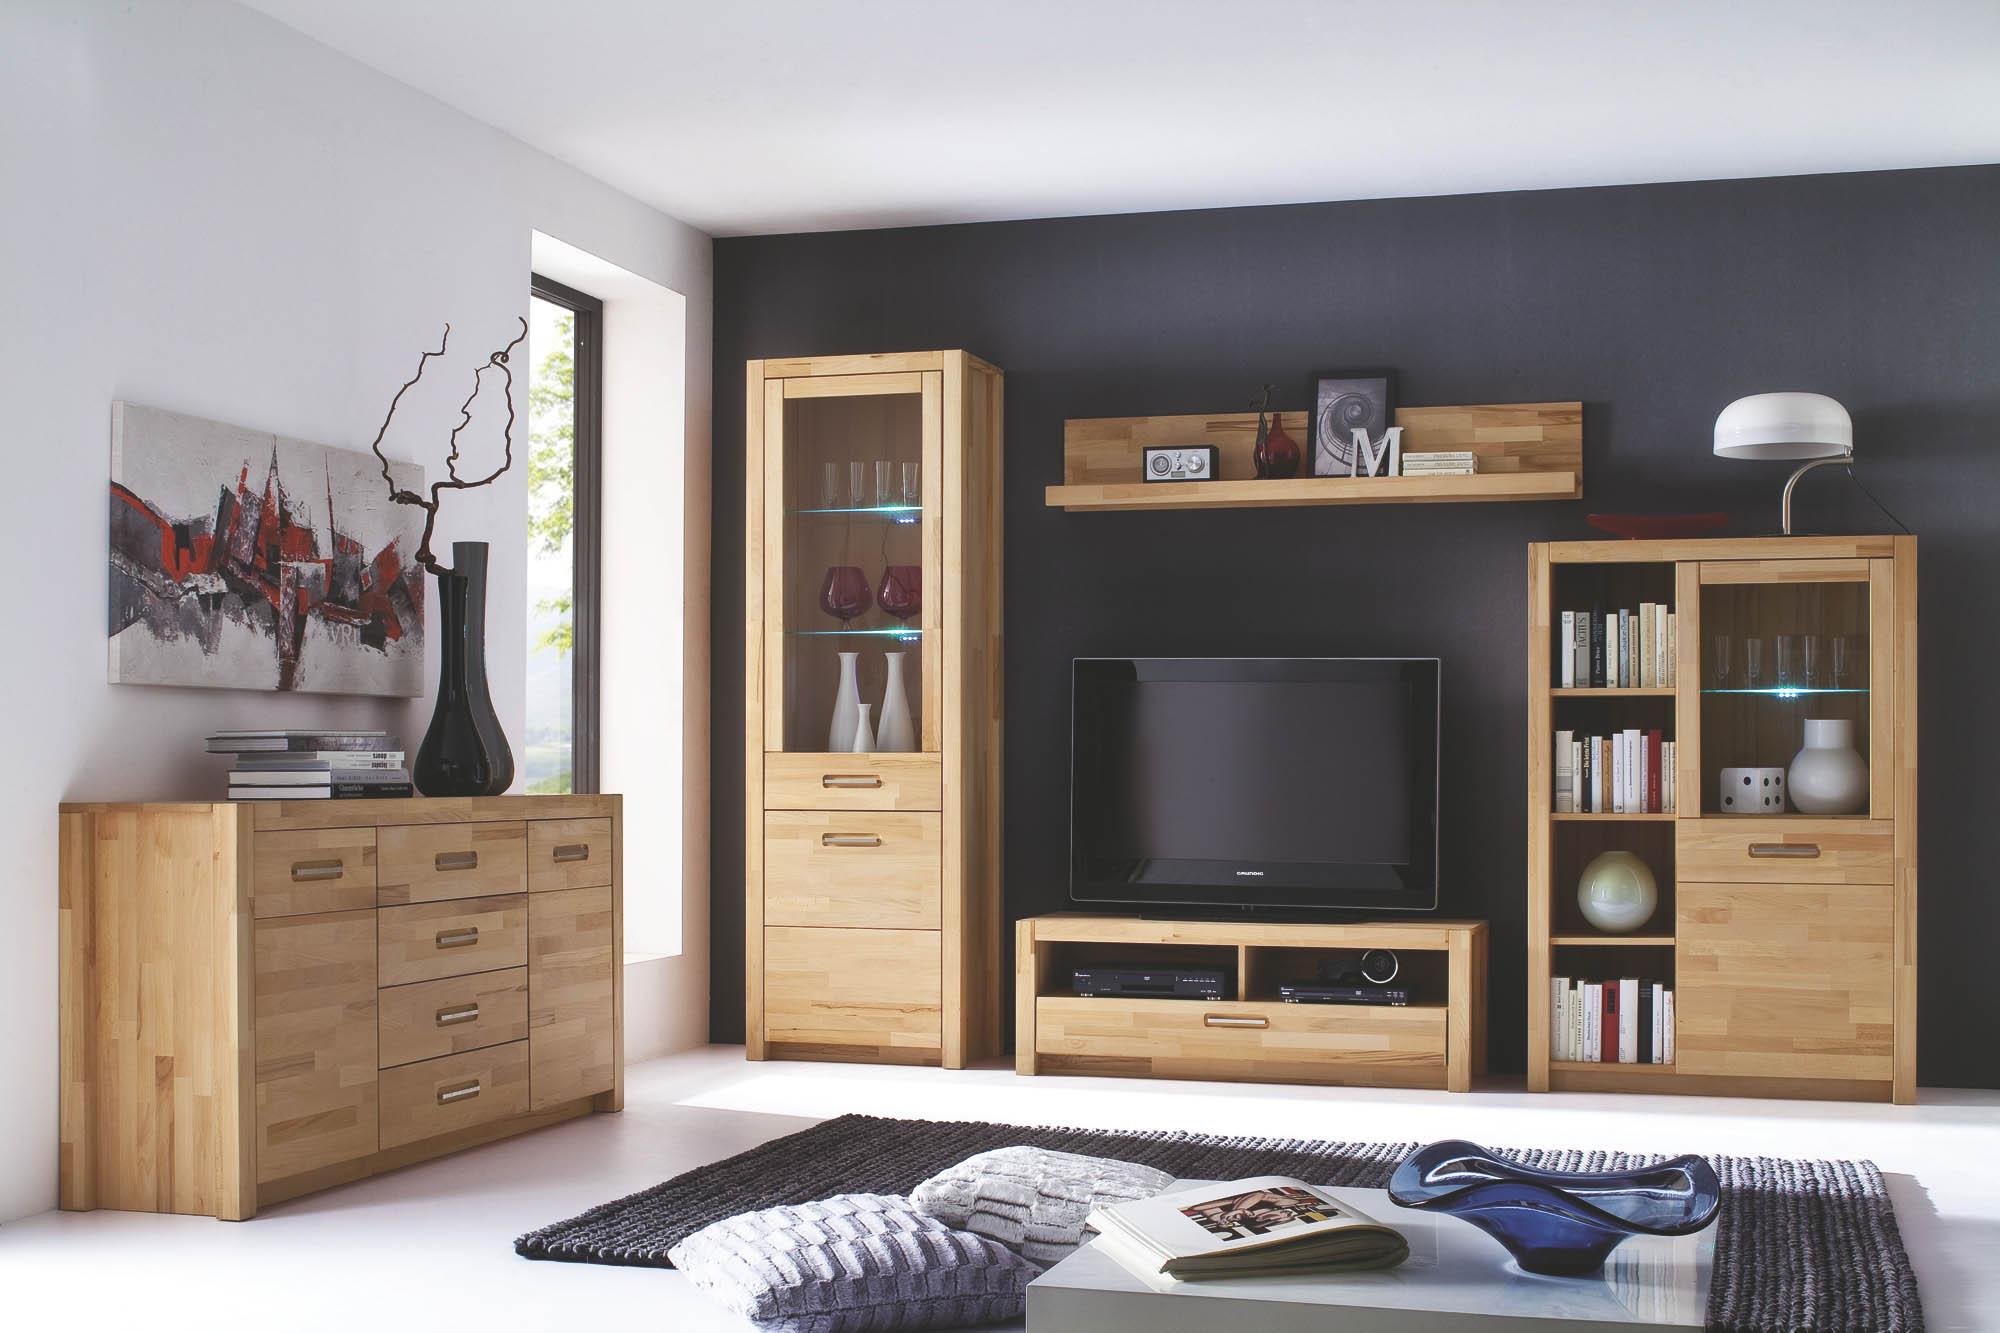 Wohnwand inkl beleuchtung 4 tlg fenja von mca furniture for Wohnwand fenja